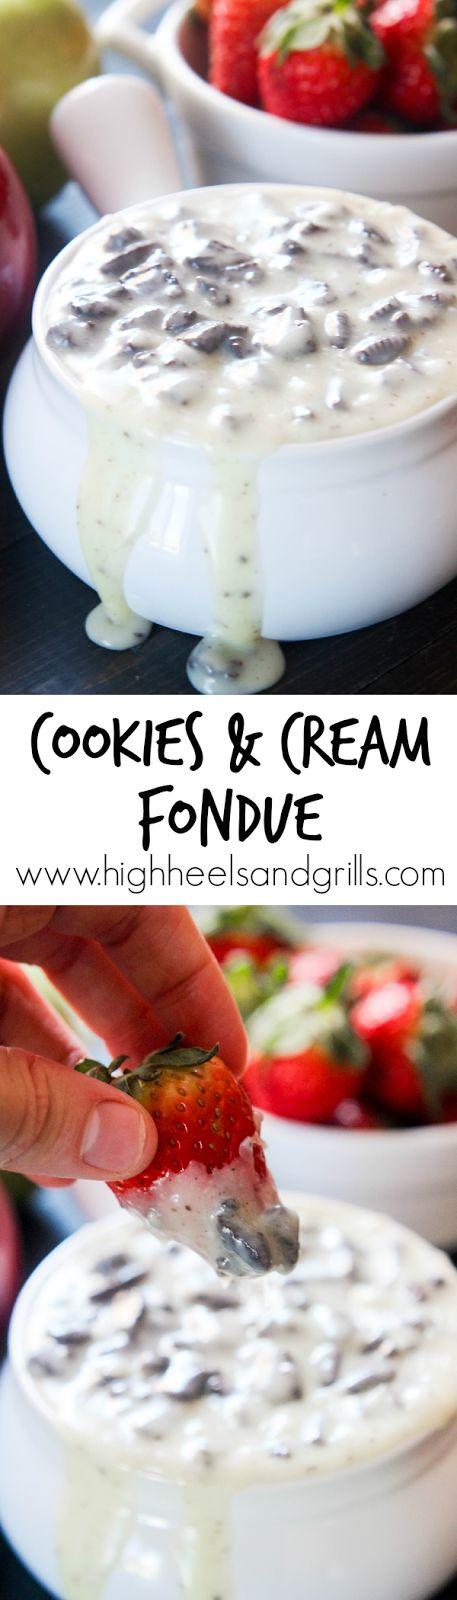 Cookies and Cream Fondue. I'm definitely taking this to my next dessert night! http://www.highheelsandgrills.com/2015/03/cookies-and-cream-fondue.html